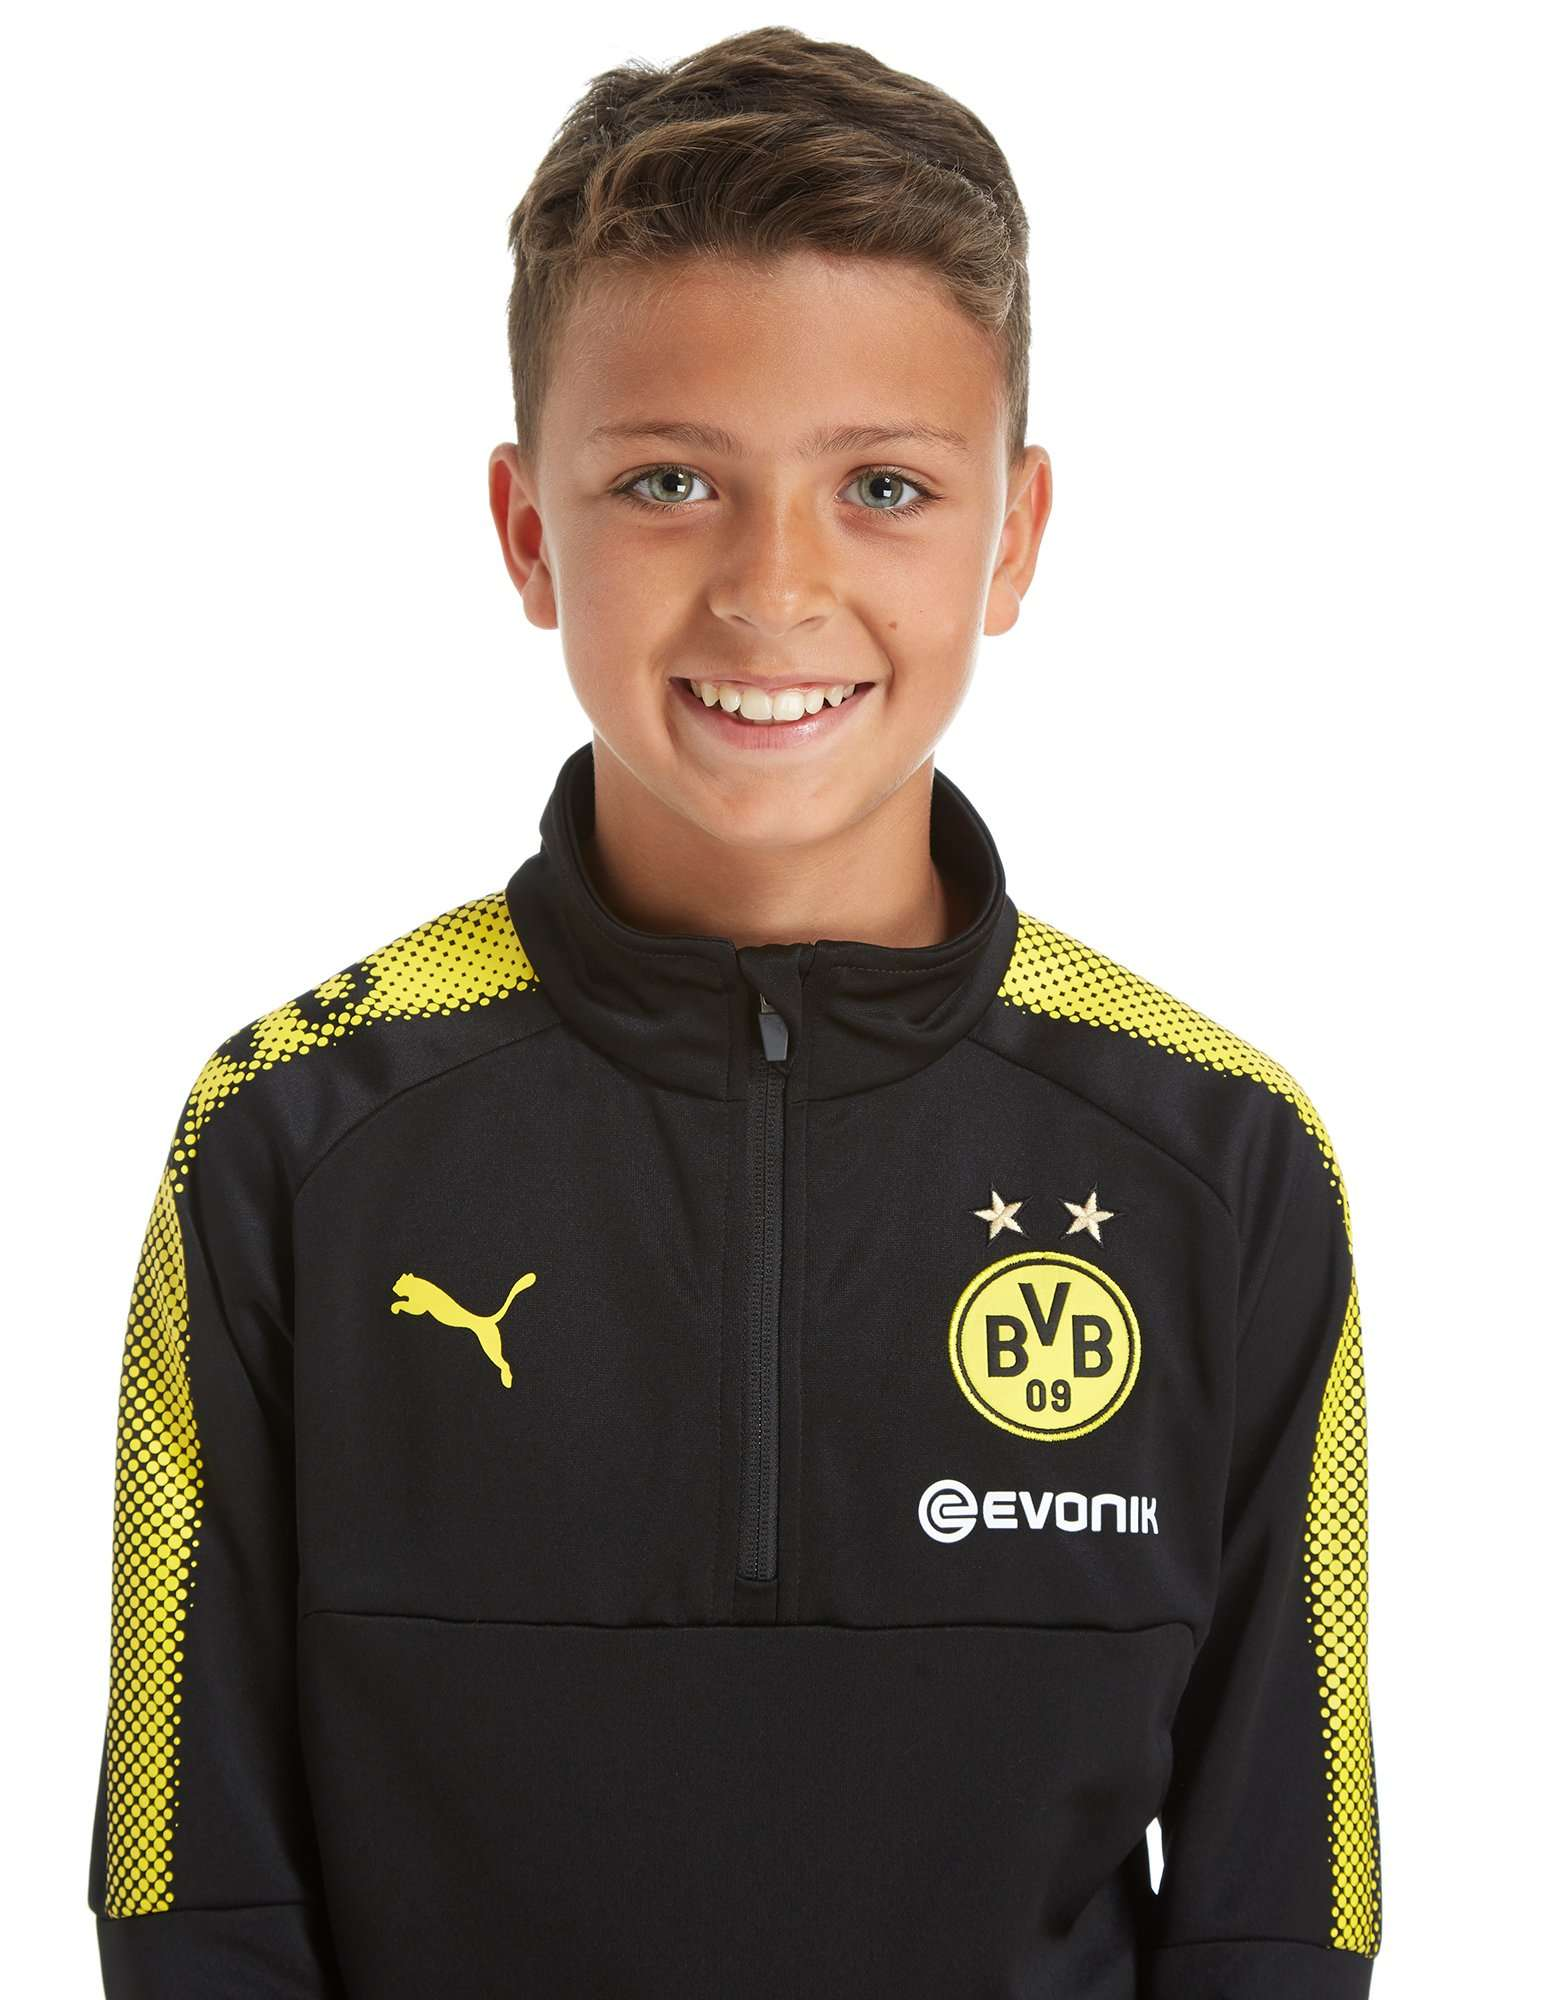 PUMA Borussia Dortmund 2017 Zip Top Junior